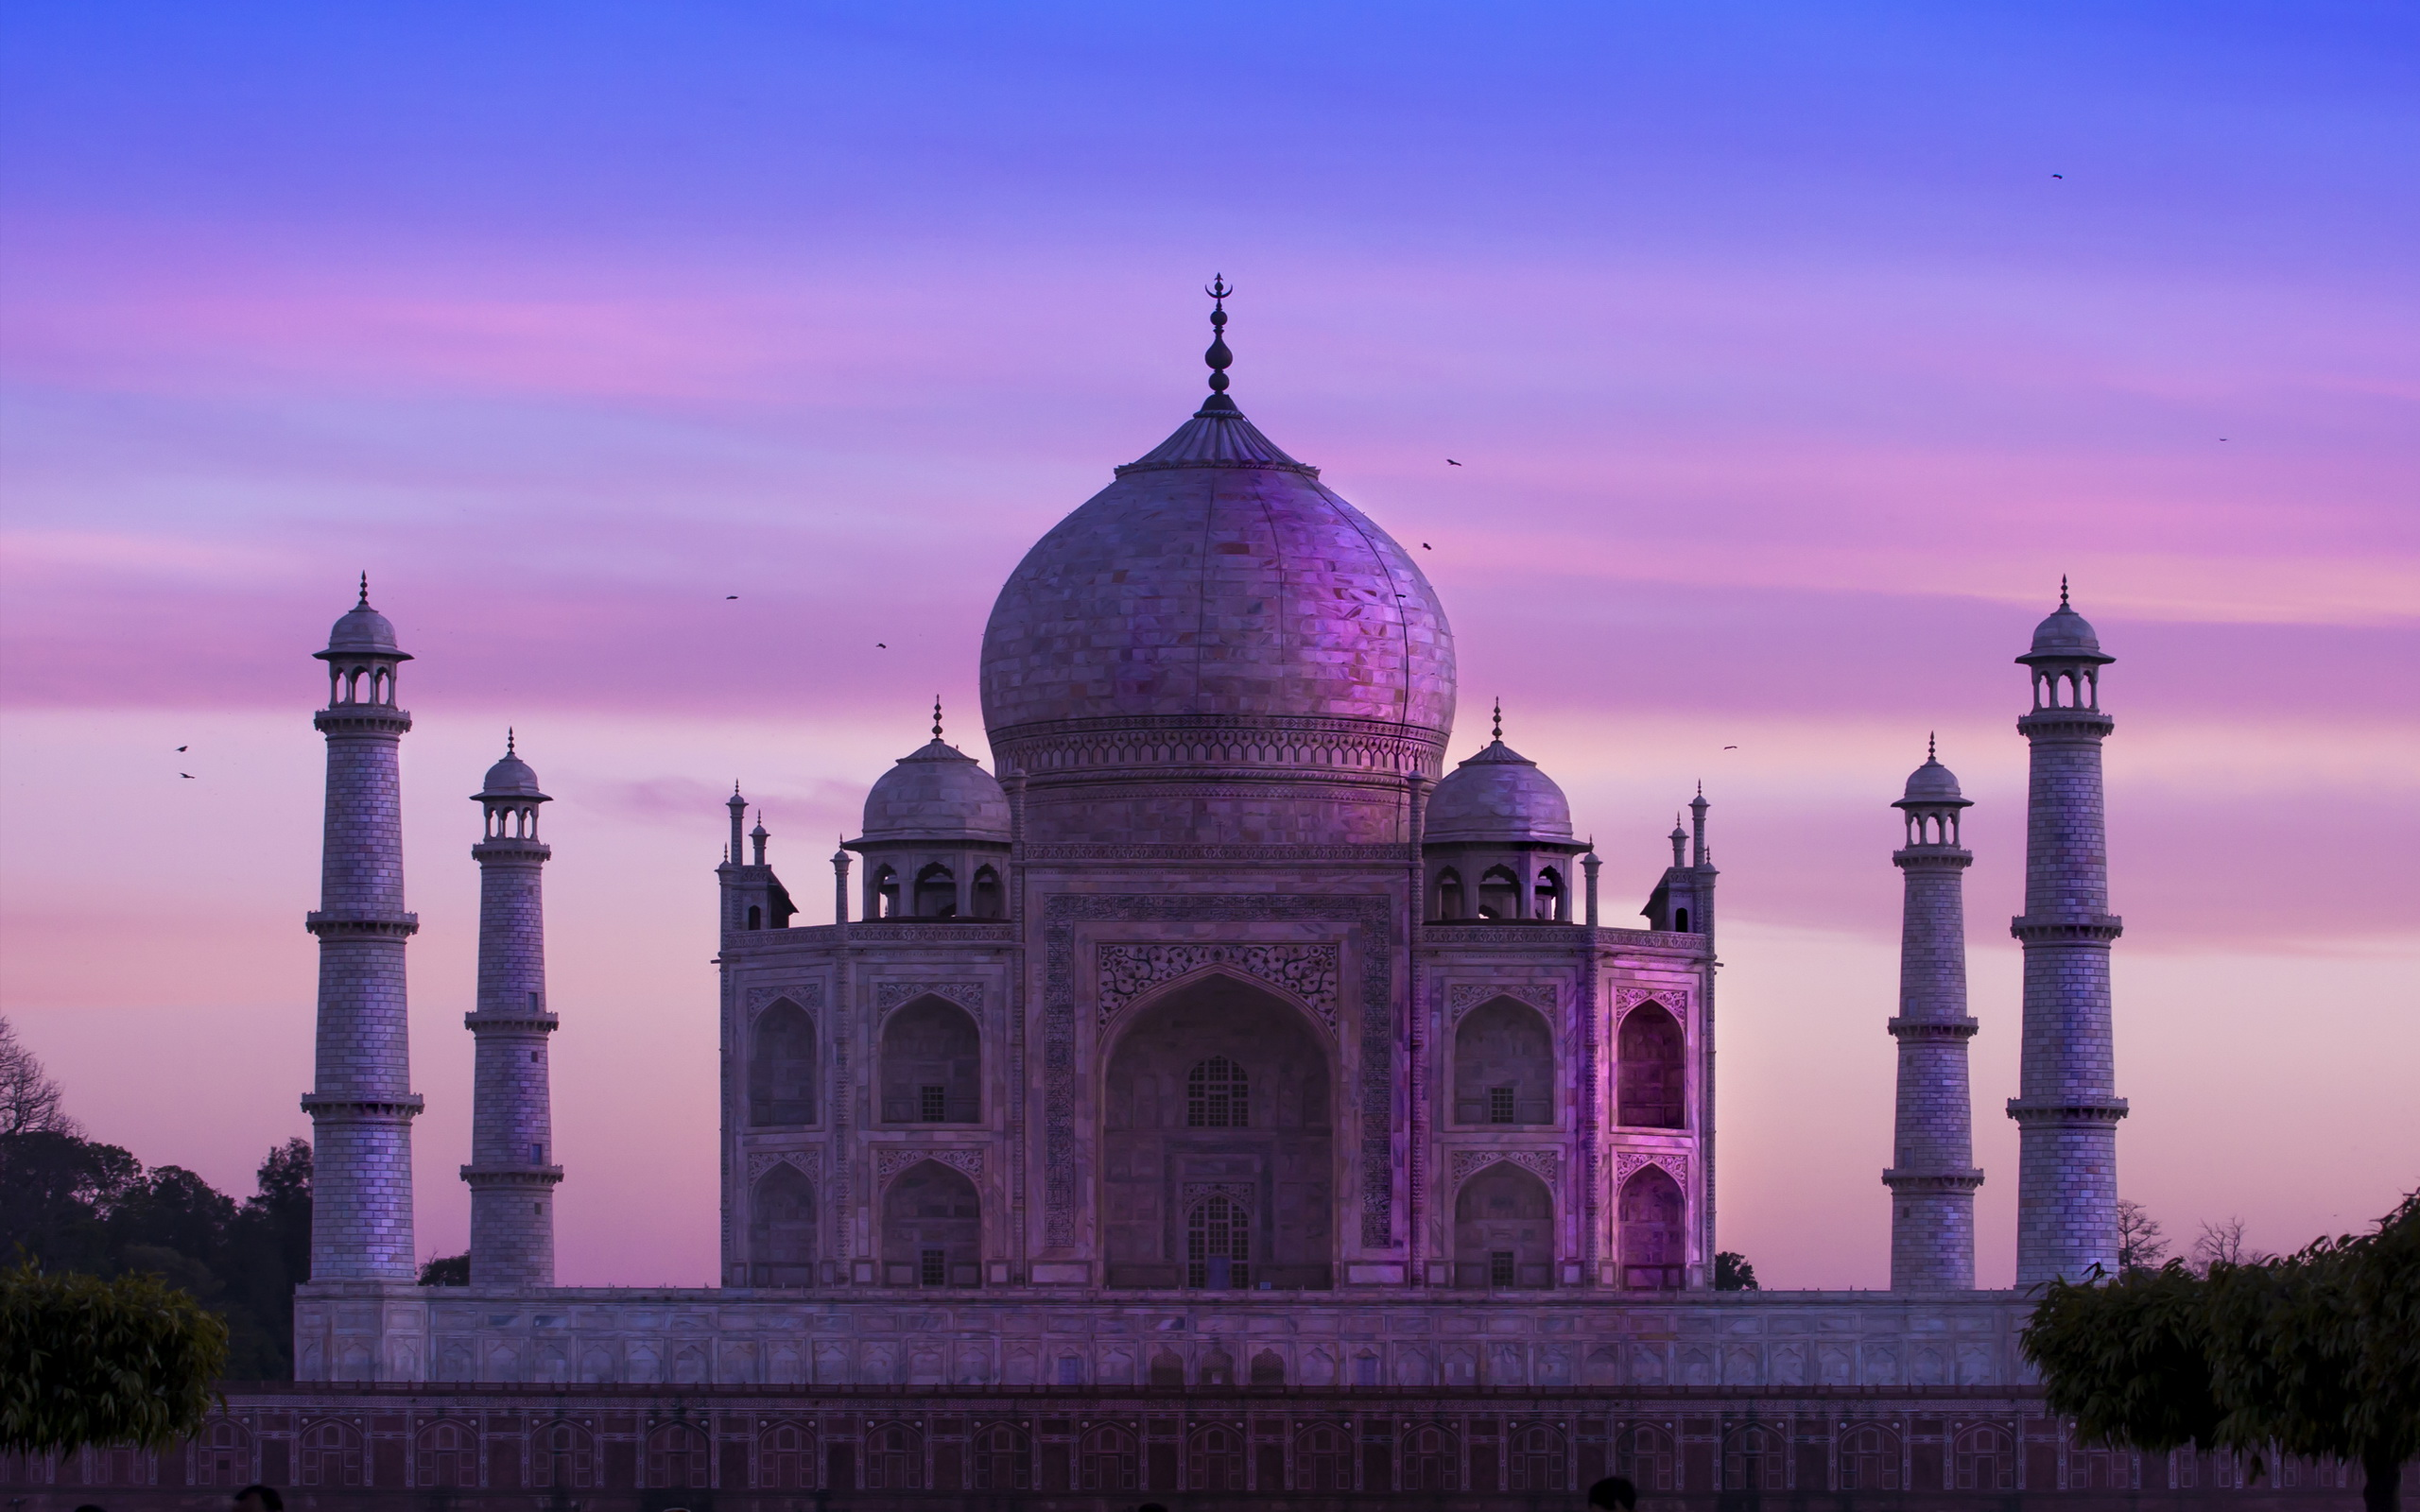 Taj Mahal Full Hd Wallpaper And Background Image